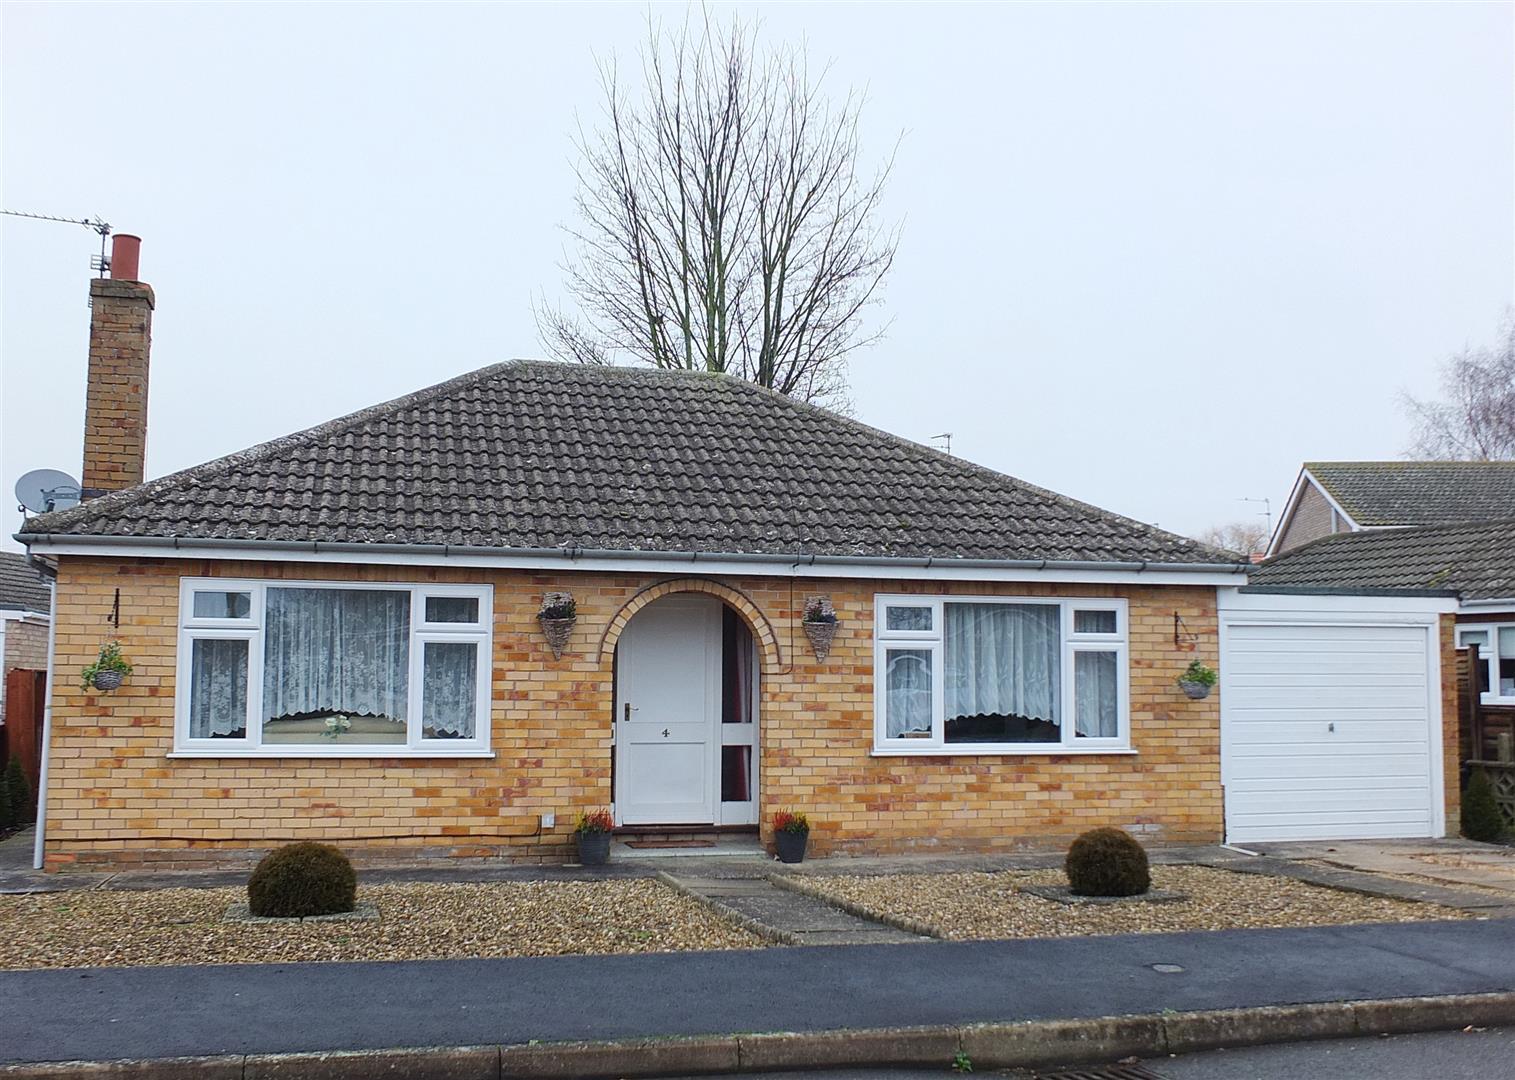 2 bed detached bungalow for sale in Long Sutton Spalding, PE12 9DU - Property Image 1